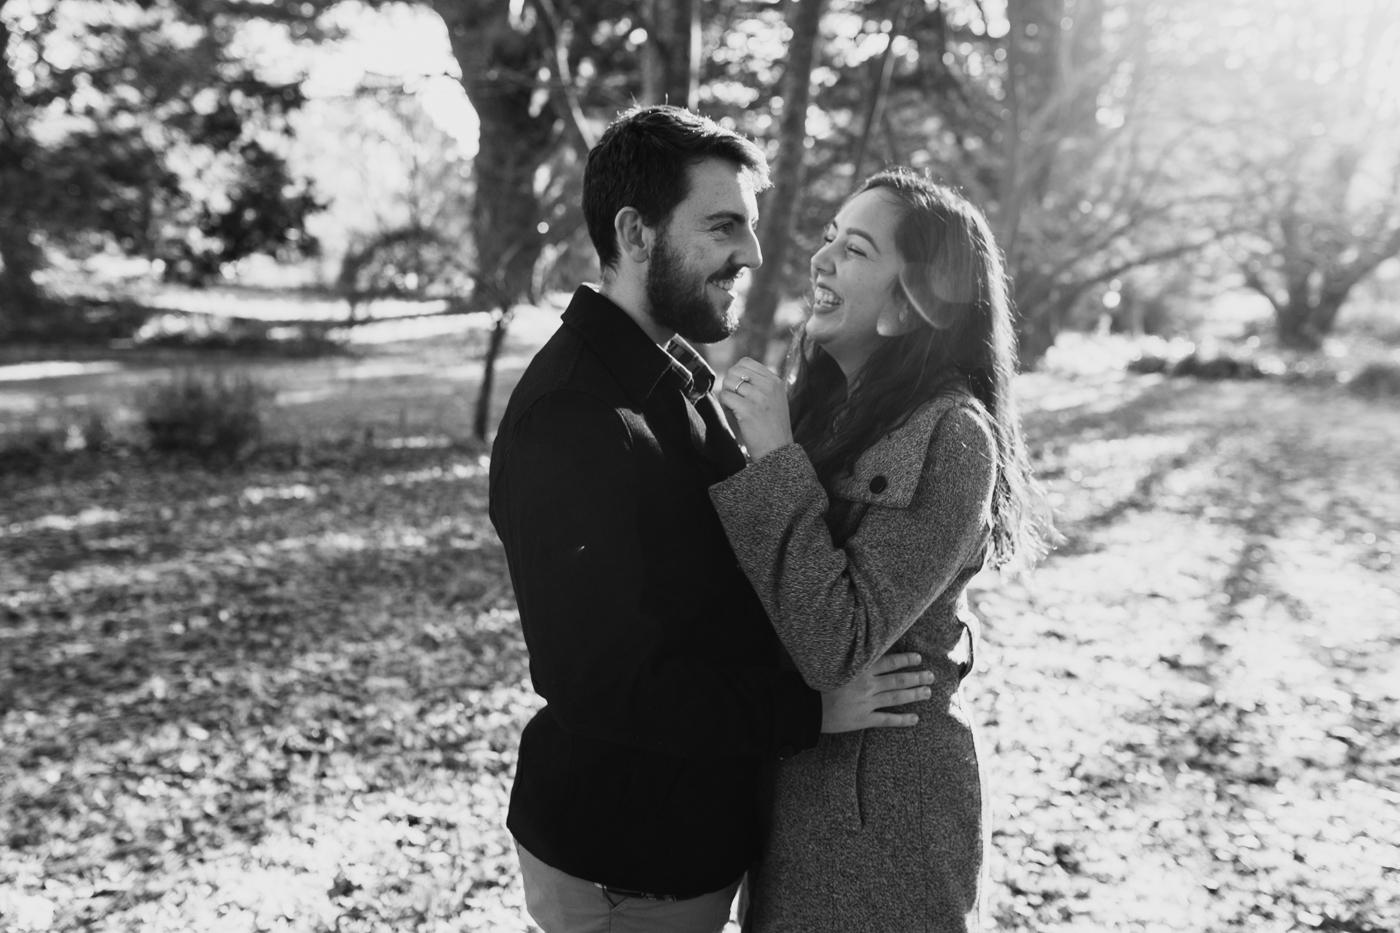 Kate & Kieran - Southern Highlands Engagement - Samantha Heather Photography-11.jpg